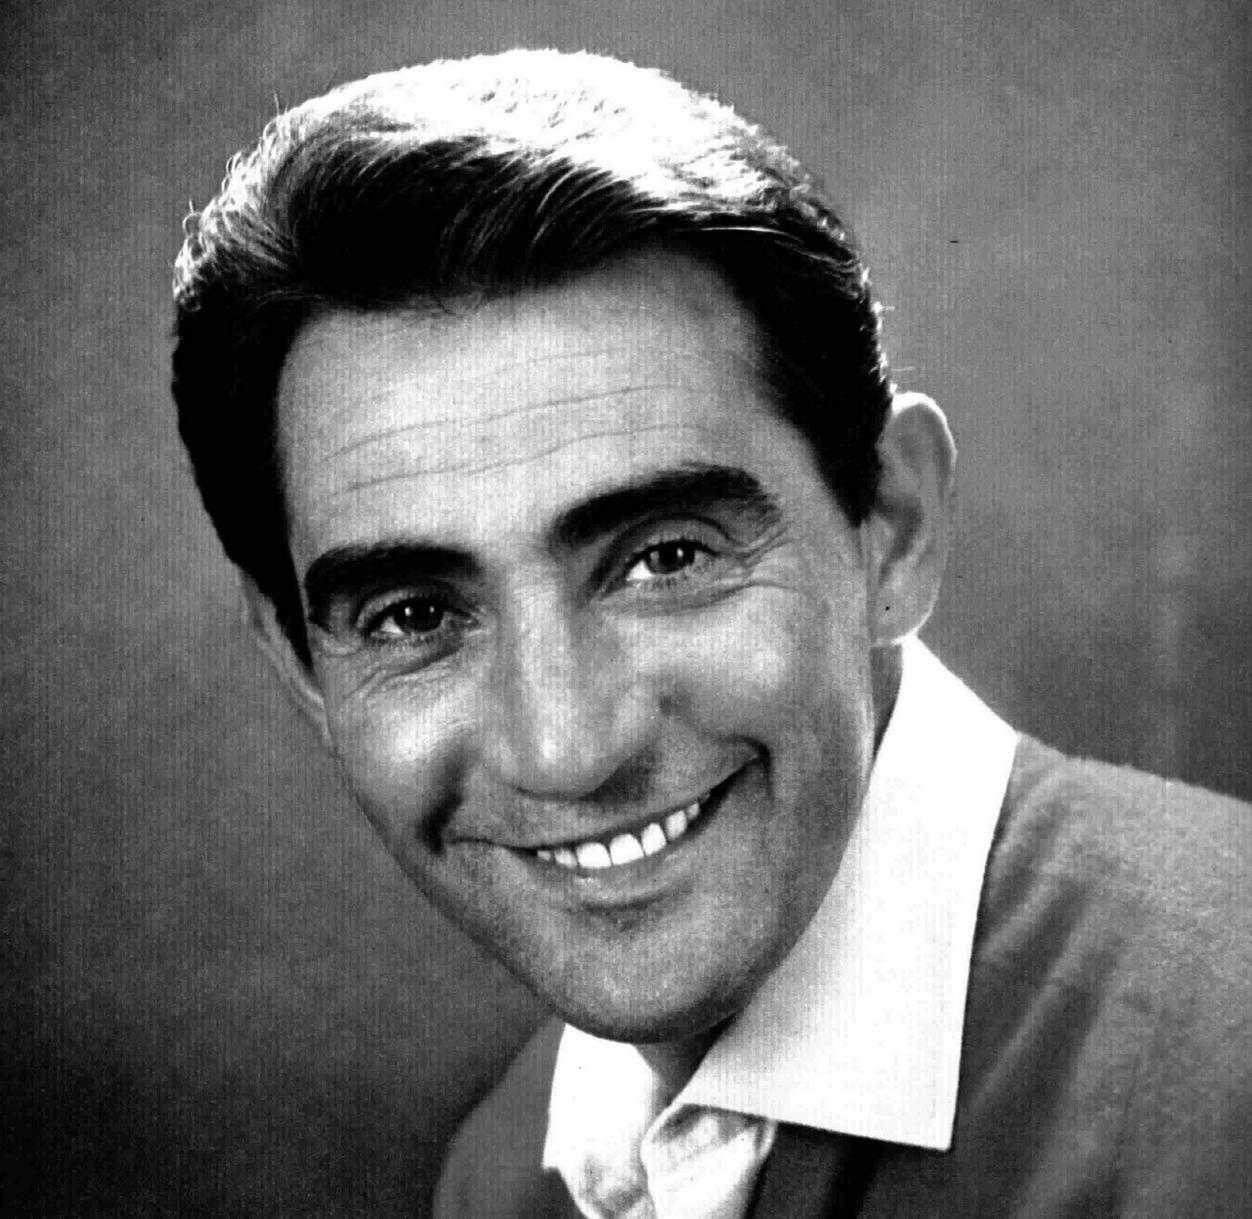 Chiari in 1964